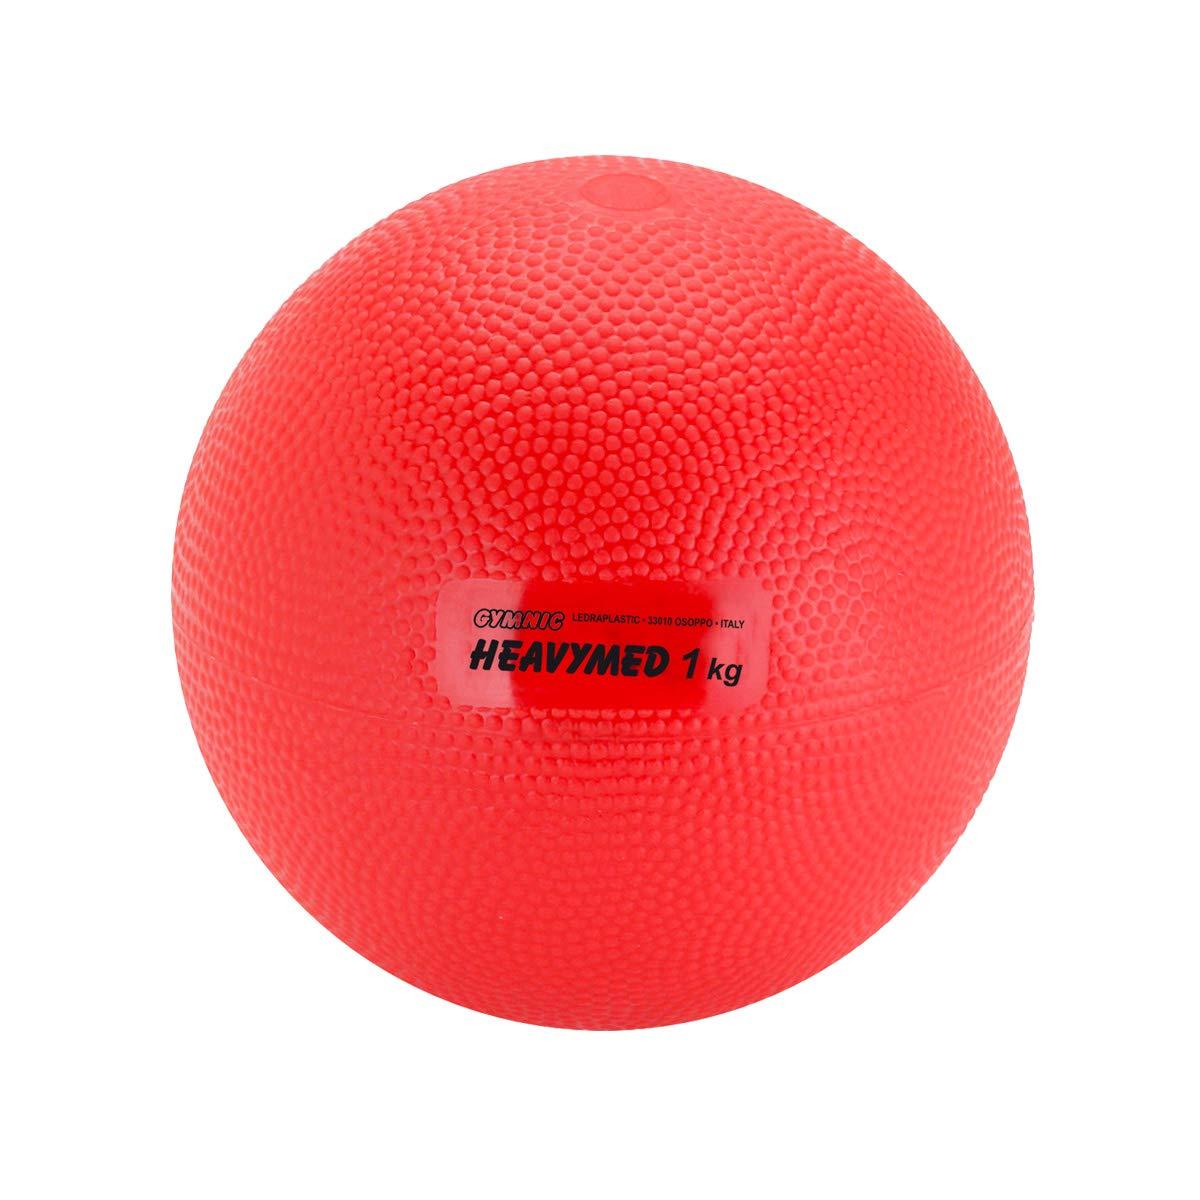 Gymnic Heavymed 1 Medicine Ball, Red (12 cm, 1 kg / 2.2 lbs)